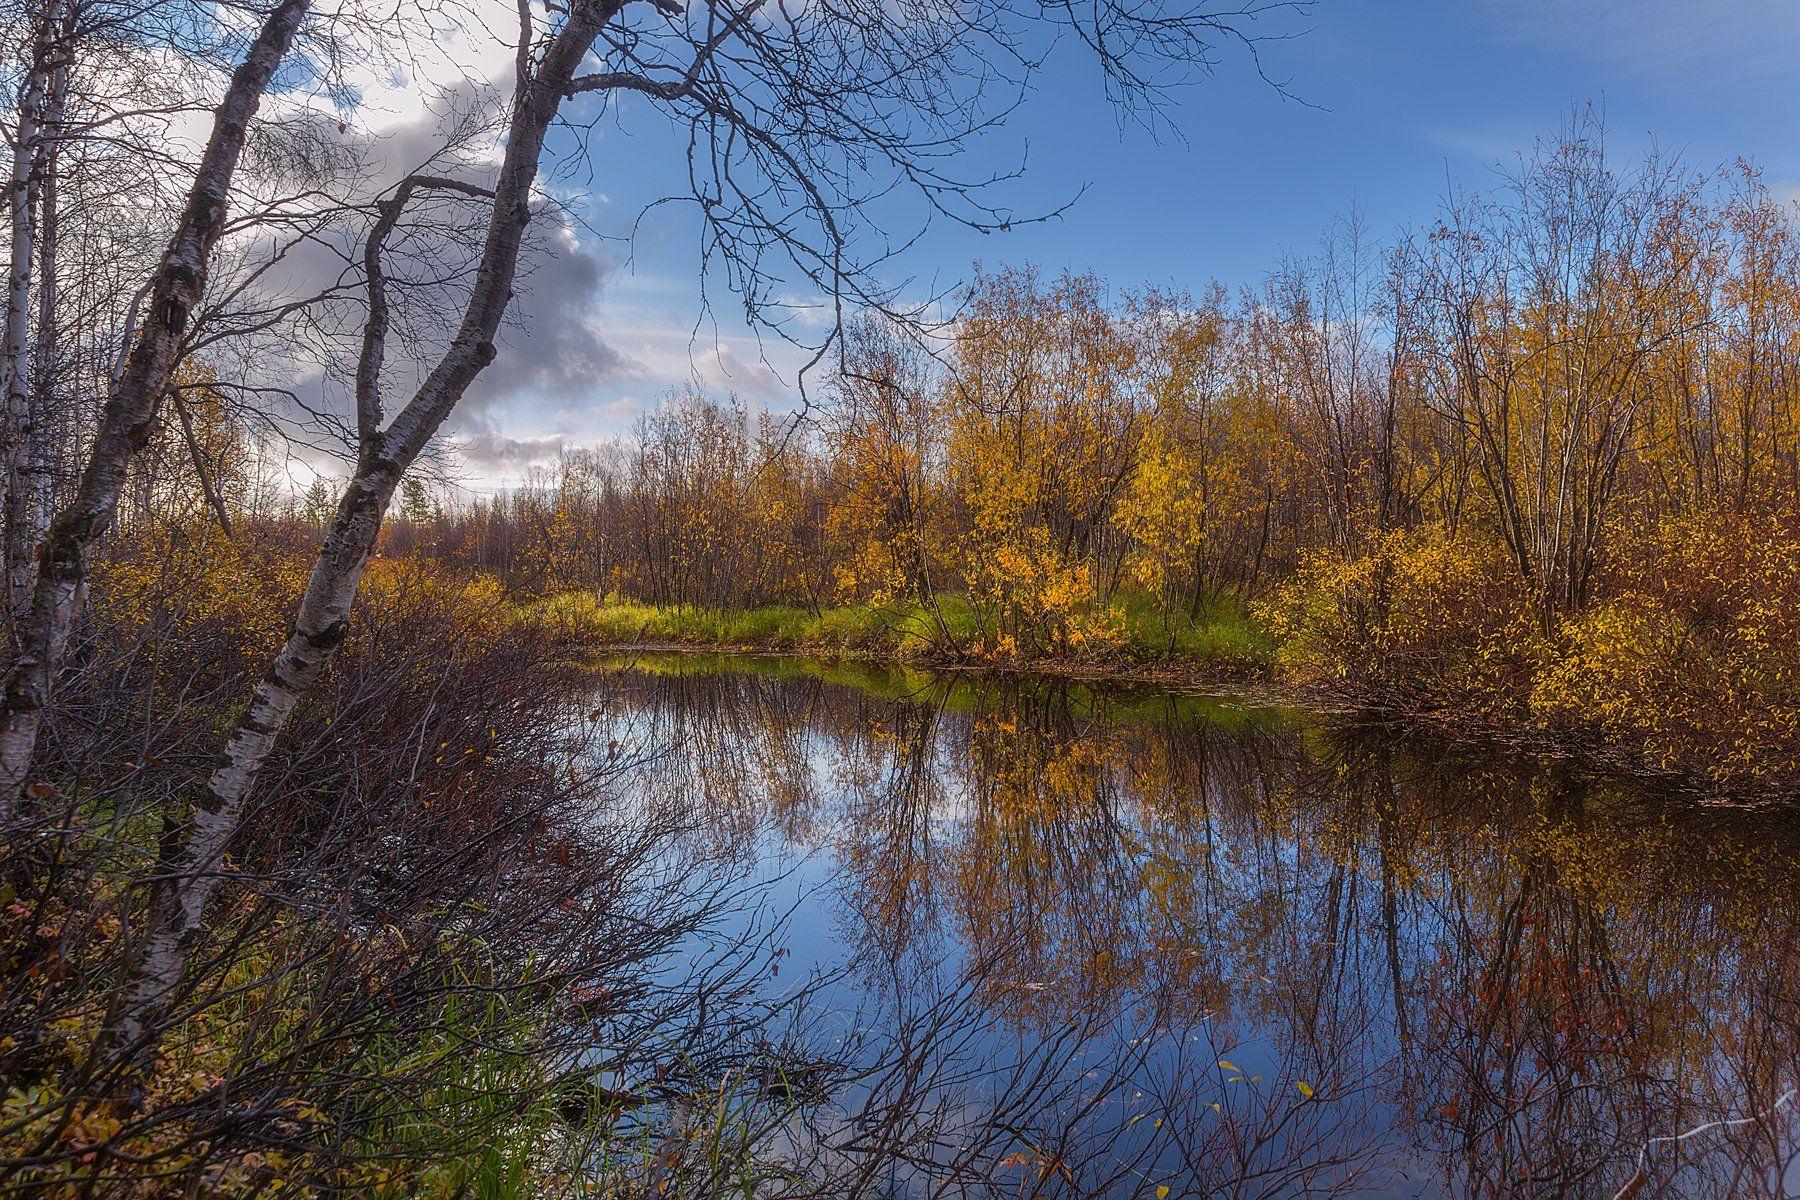 Золото, Осень, Рыбалка, Сентябрь, Ямал, Pavel  Evgrafov